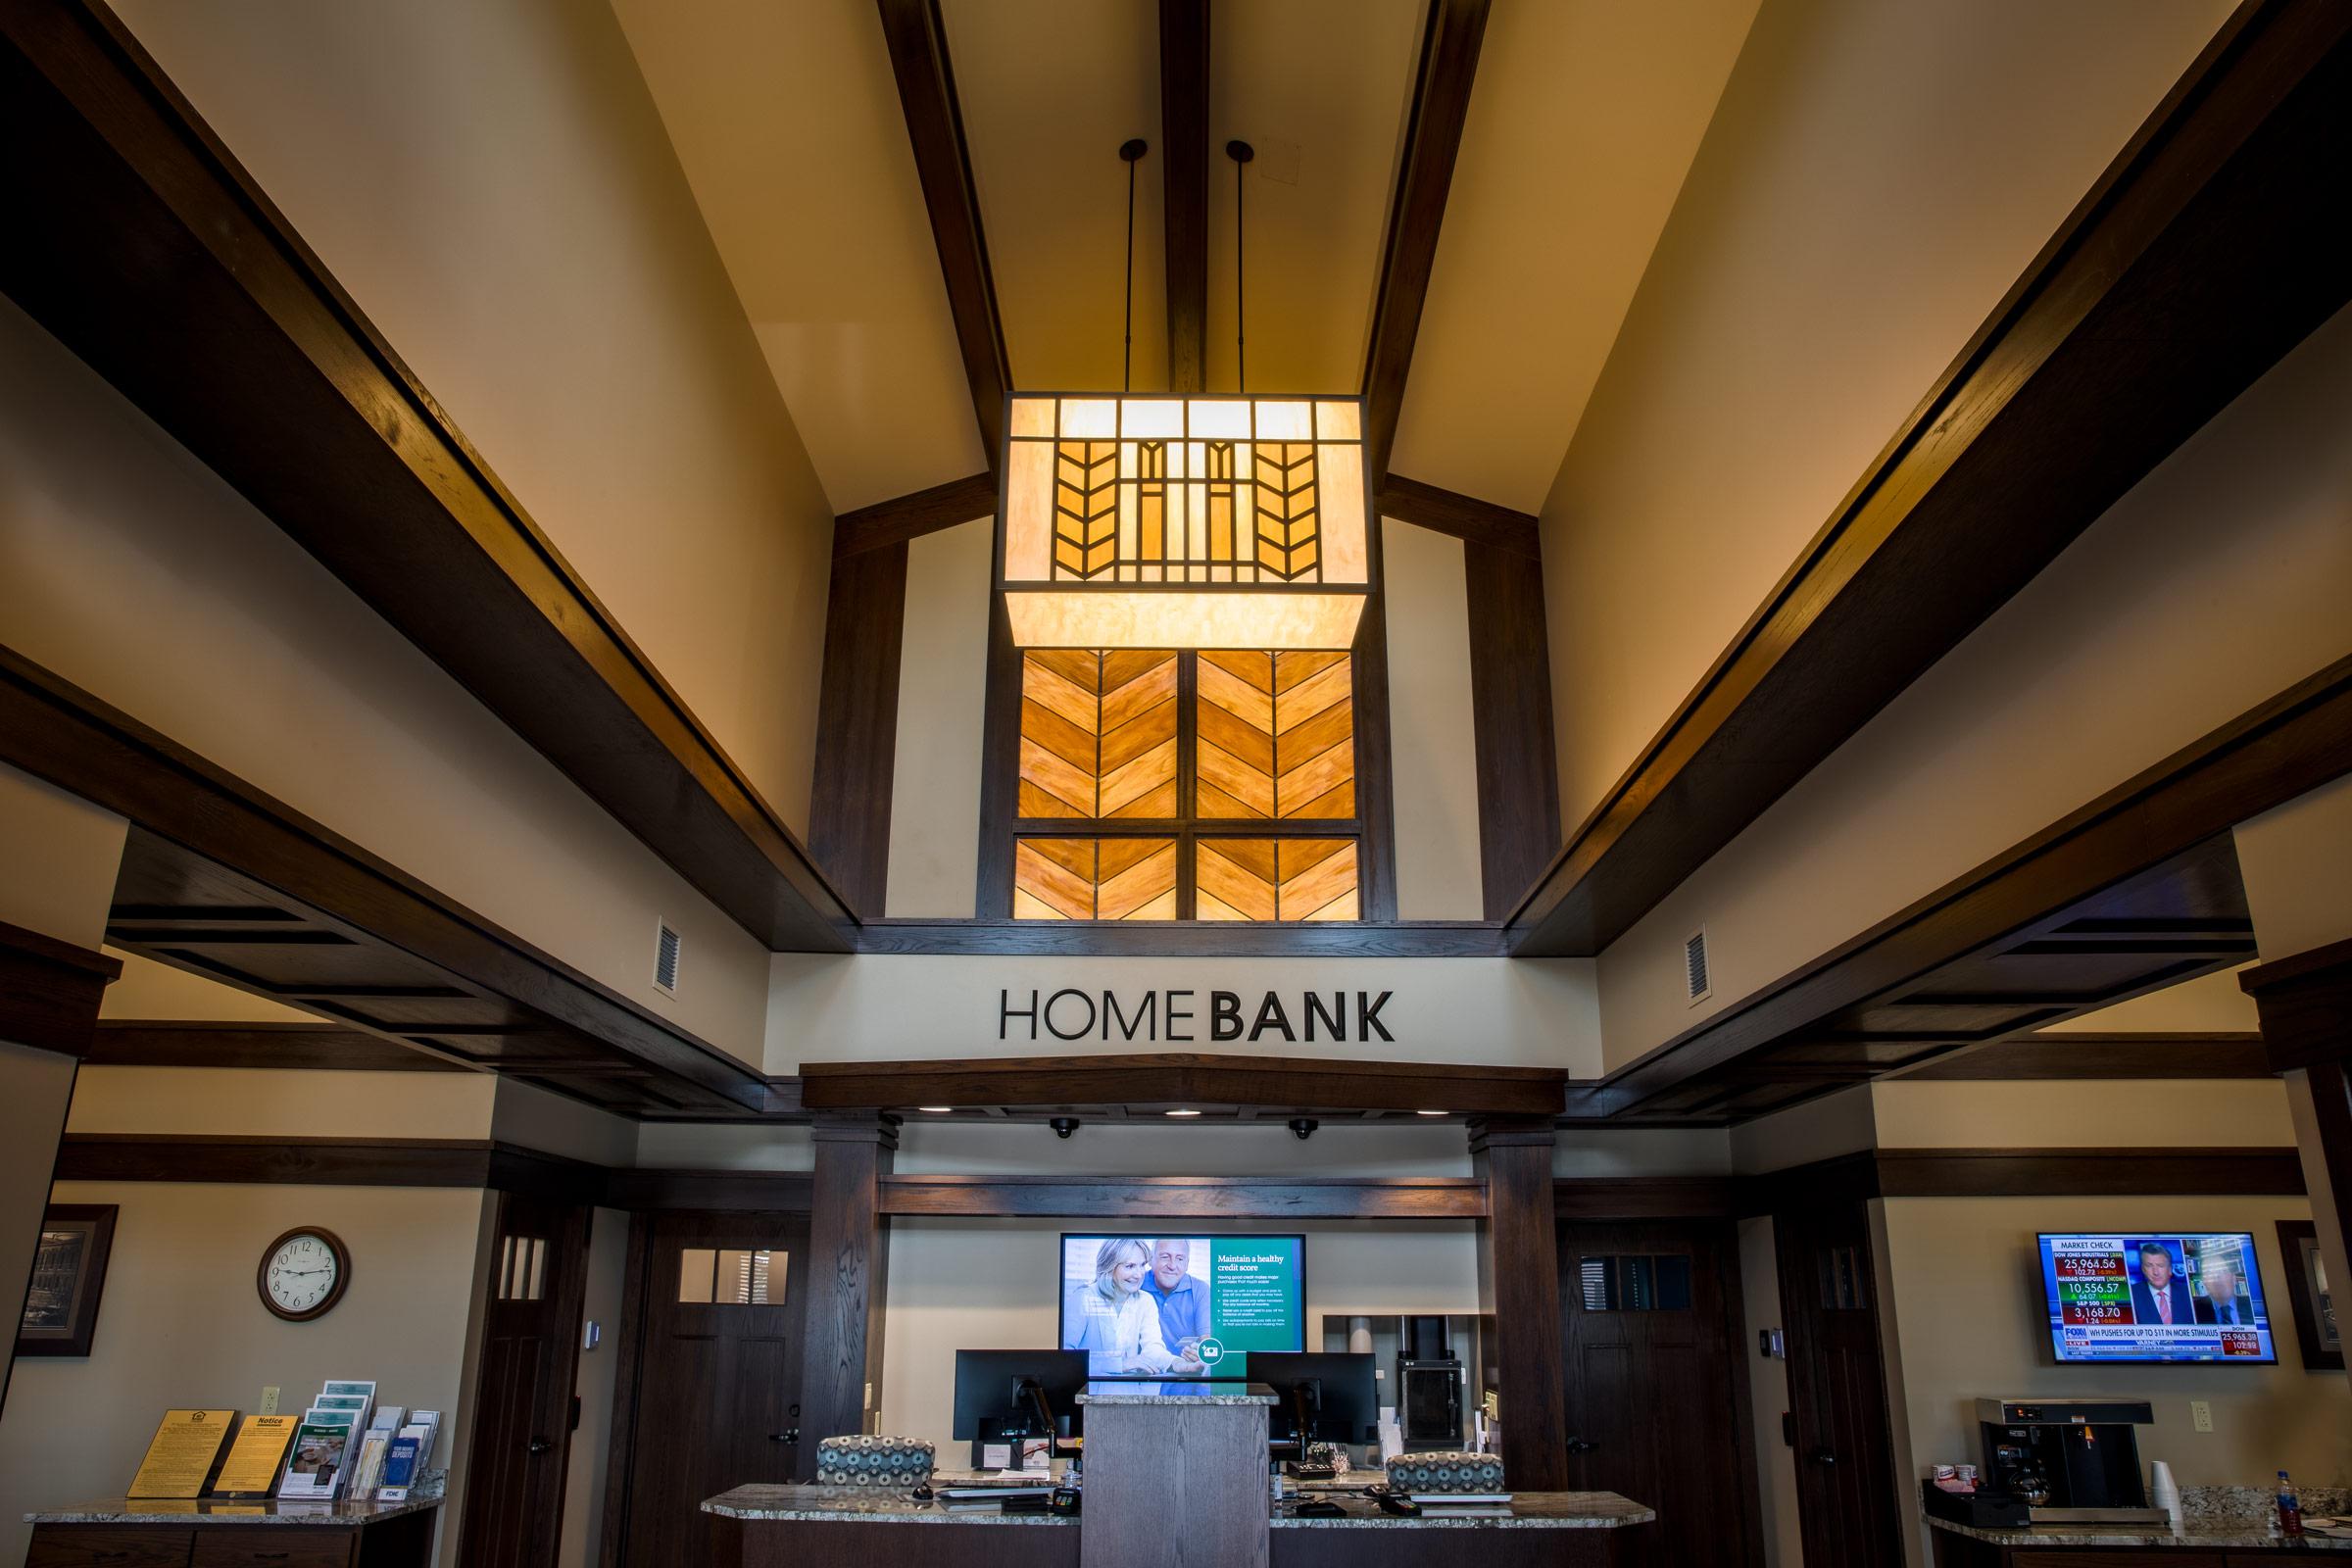 Homebank building lobby